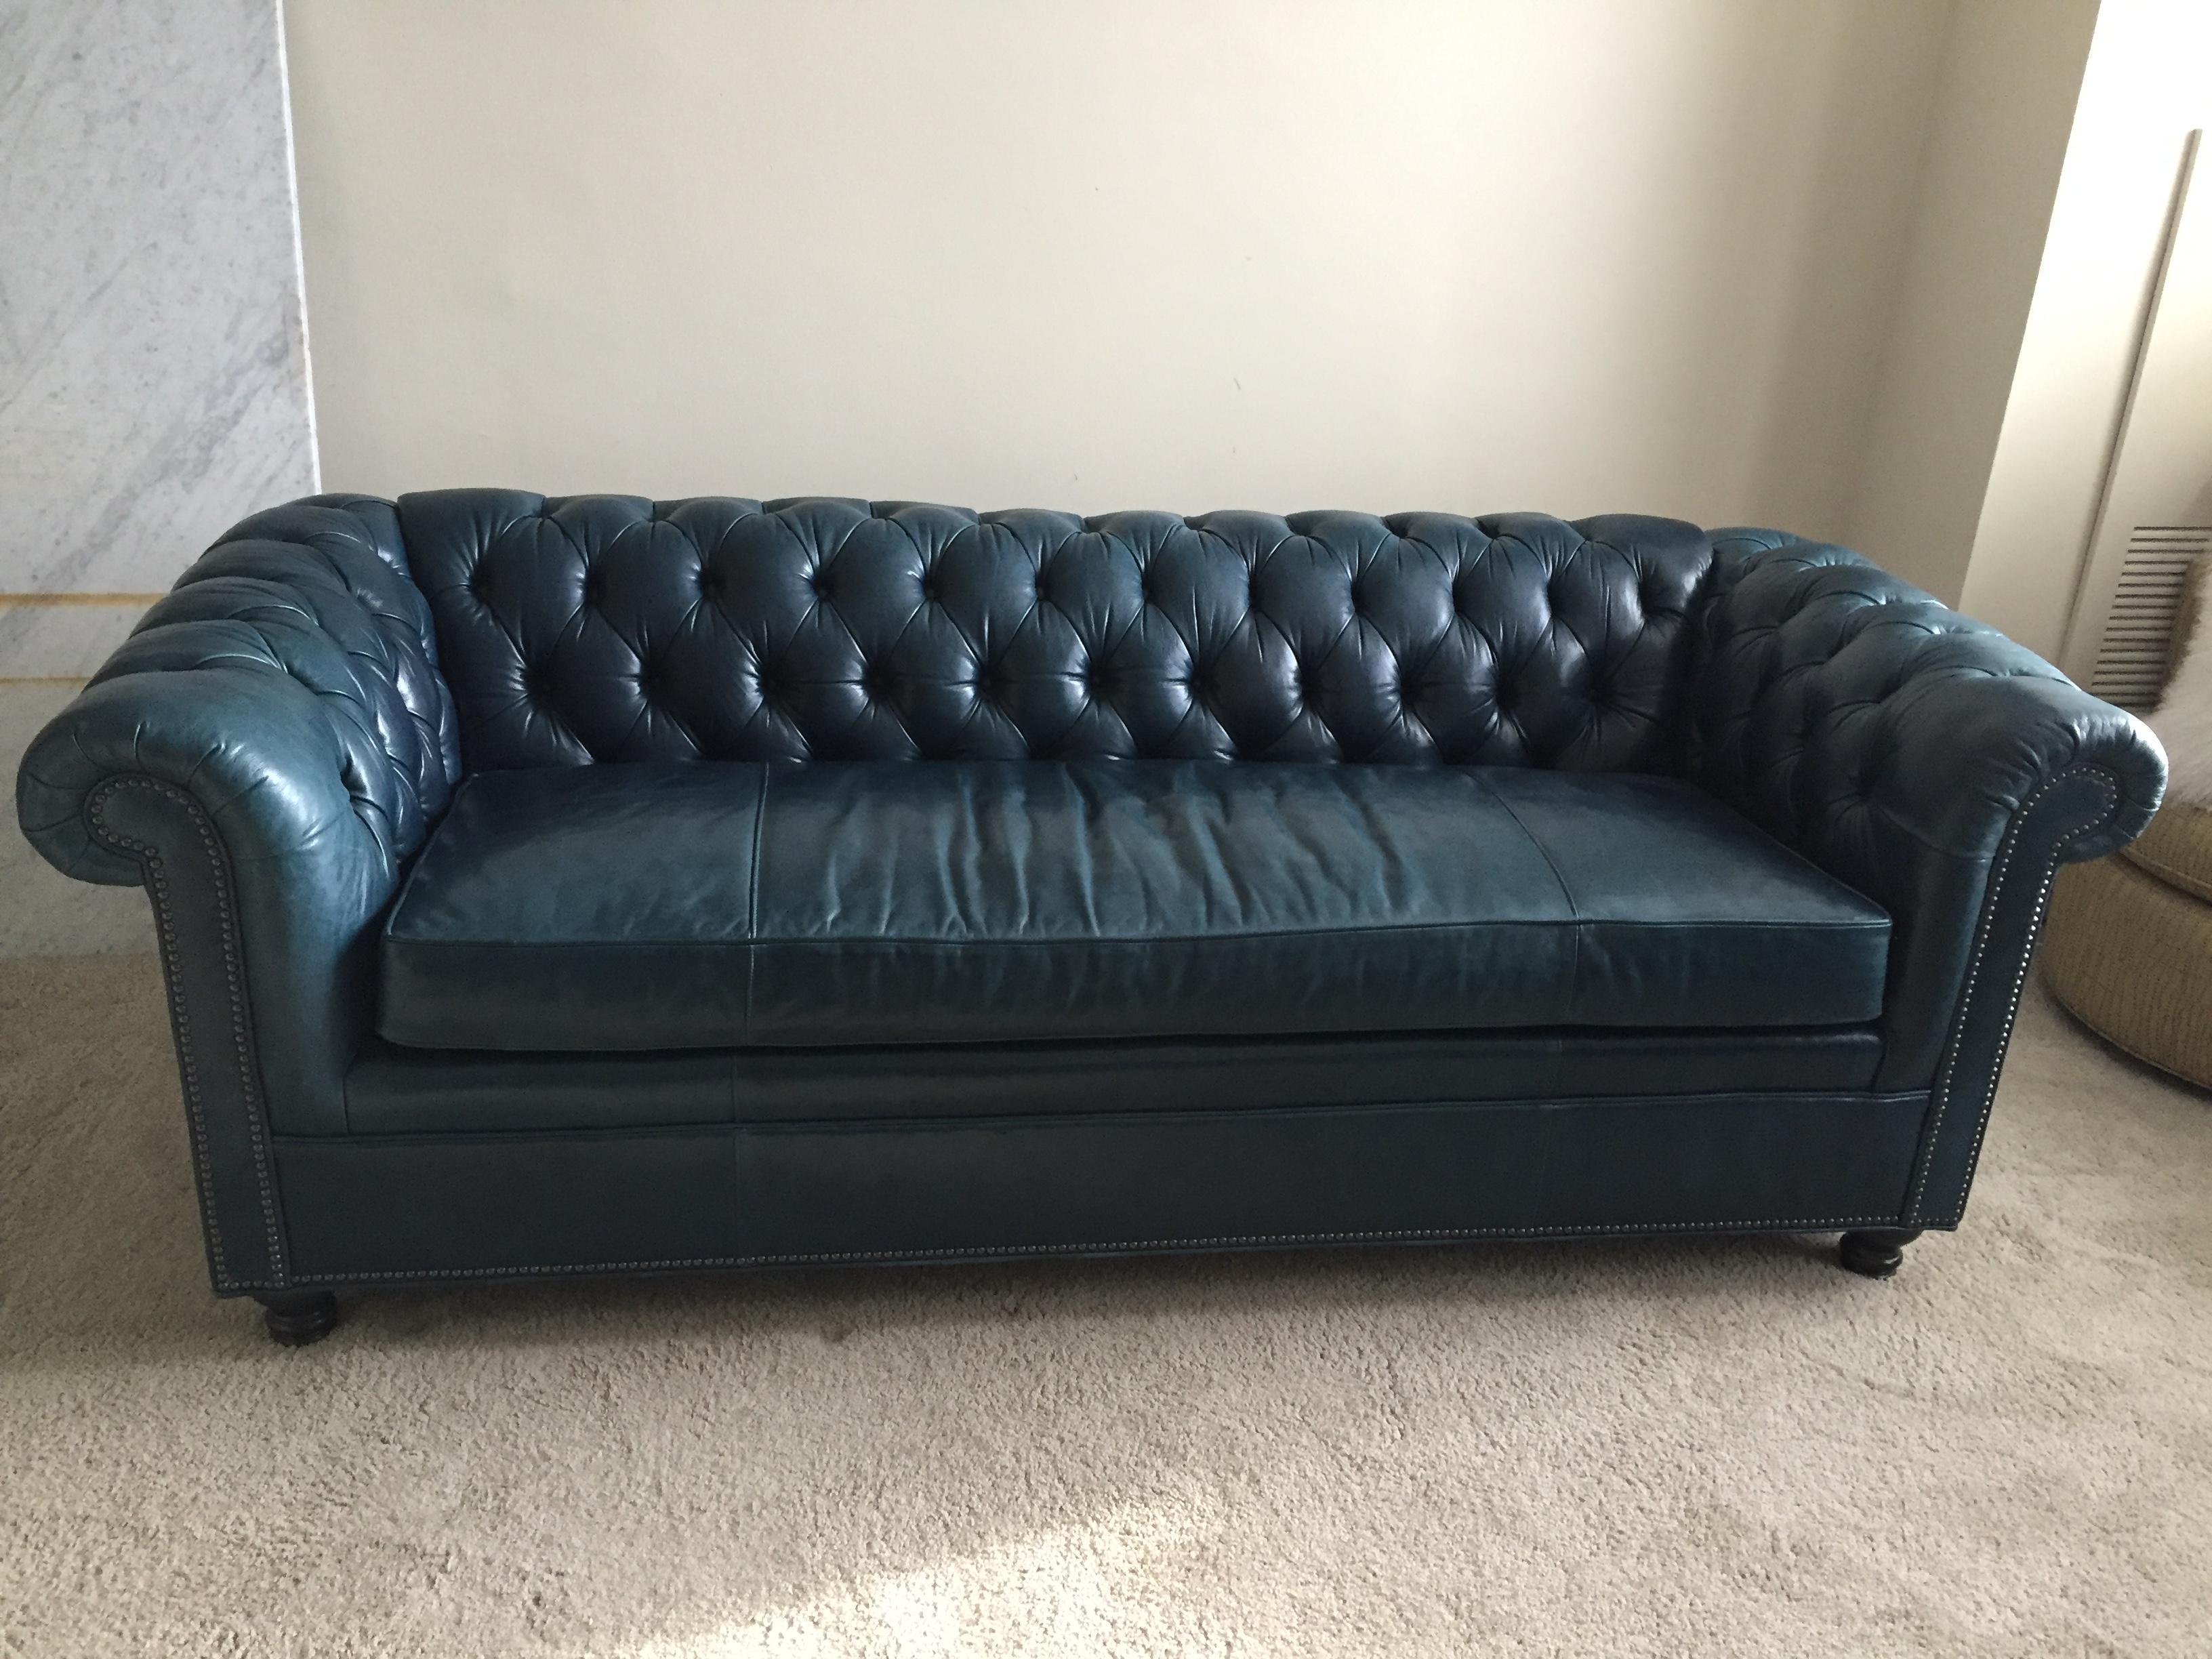 Arhaus Berwick Leather Tufted Sofa   Image 2 Of 9